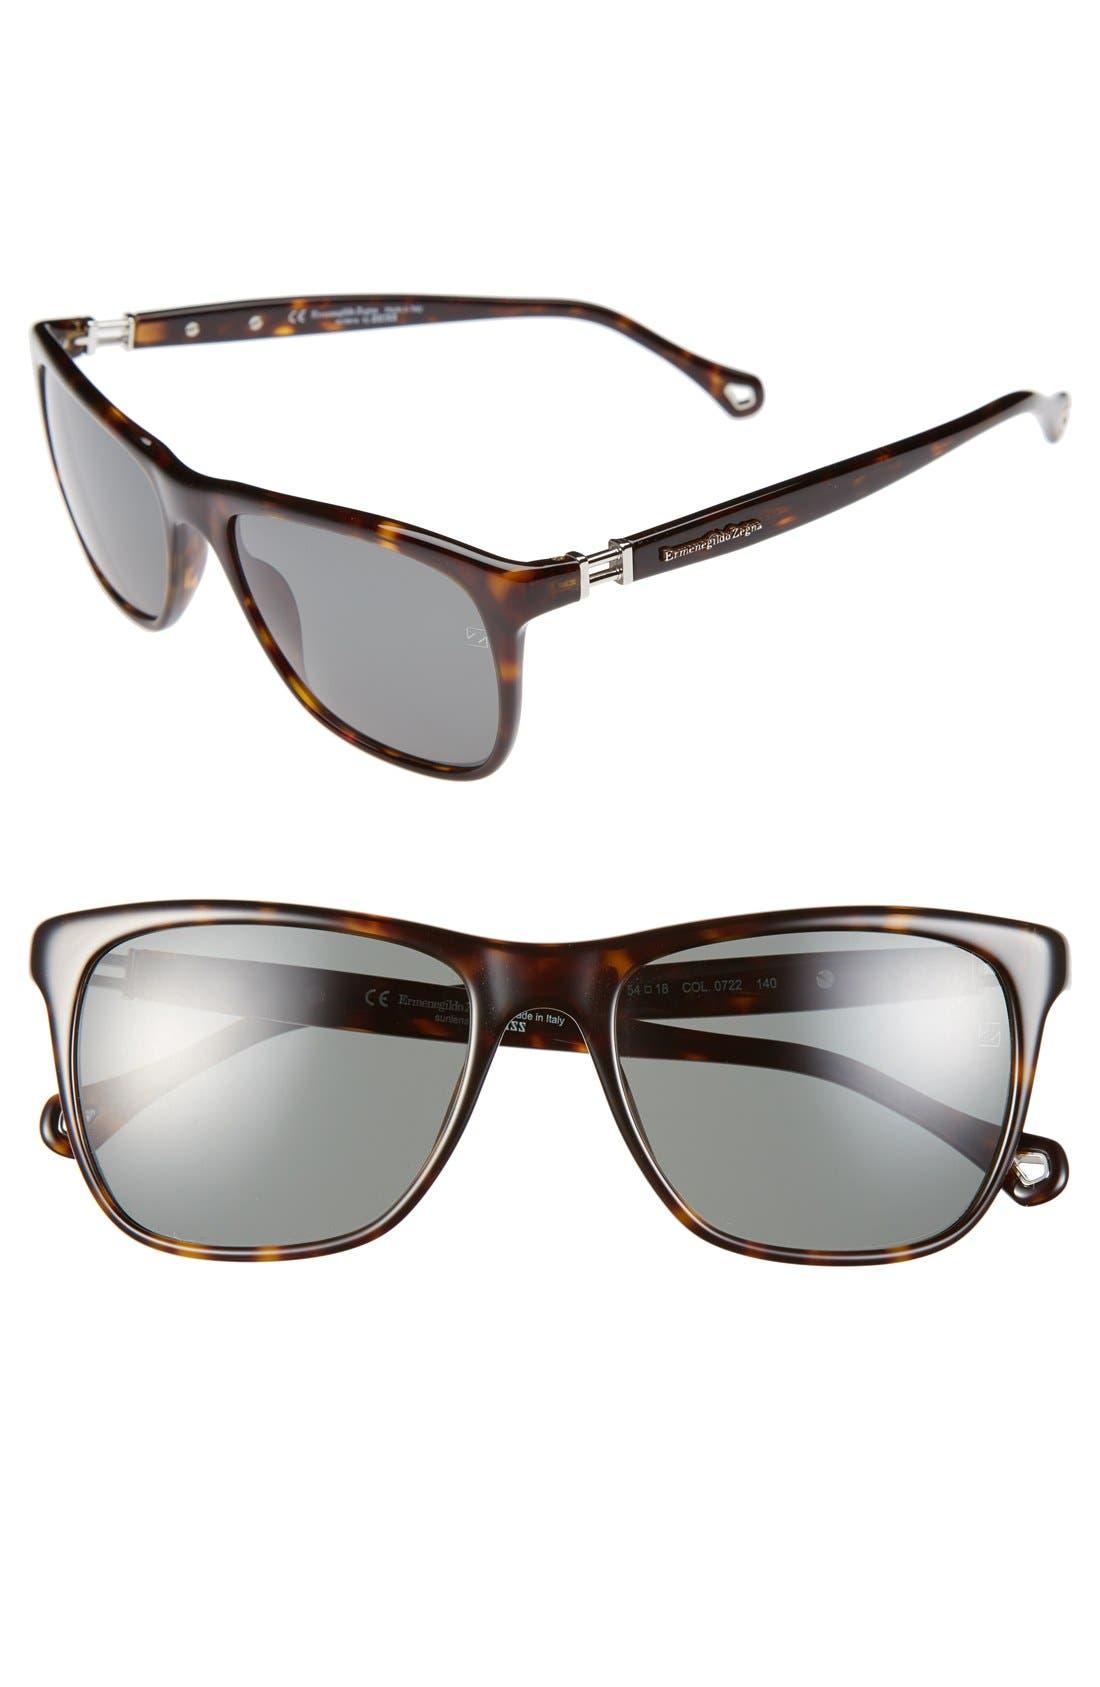 Alternate Image 1 Selected - Ermenegildo Zegna 54mm Sunglasses